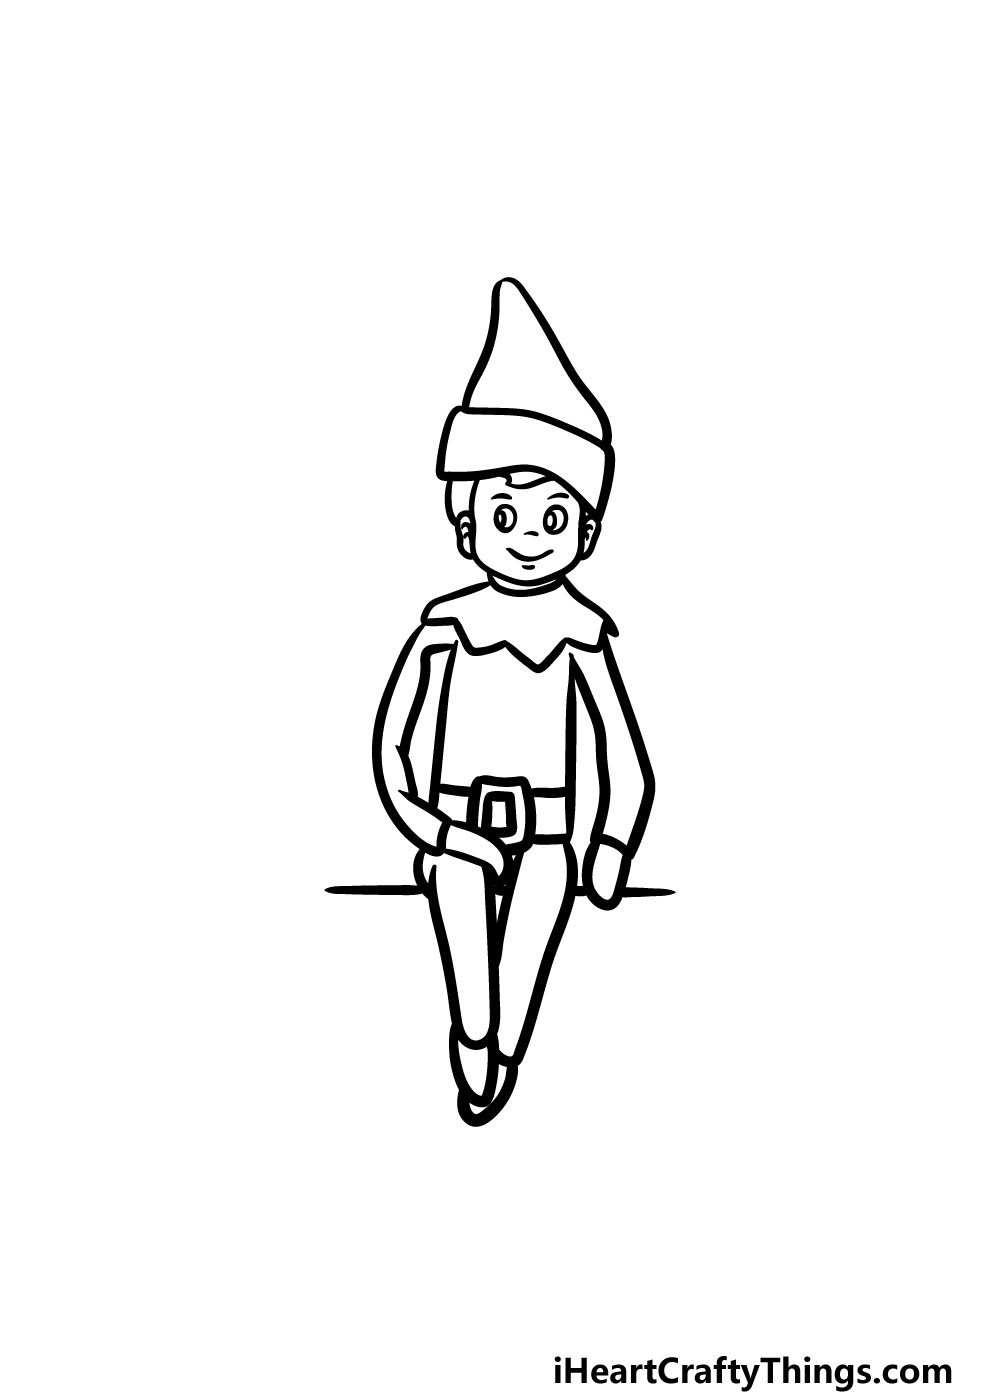 drawing an elf on a shelf step 5